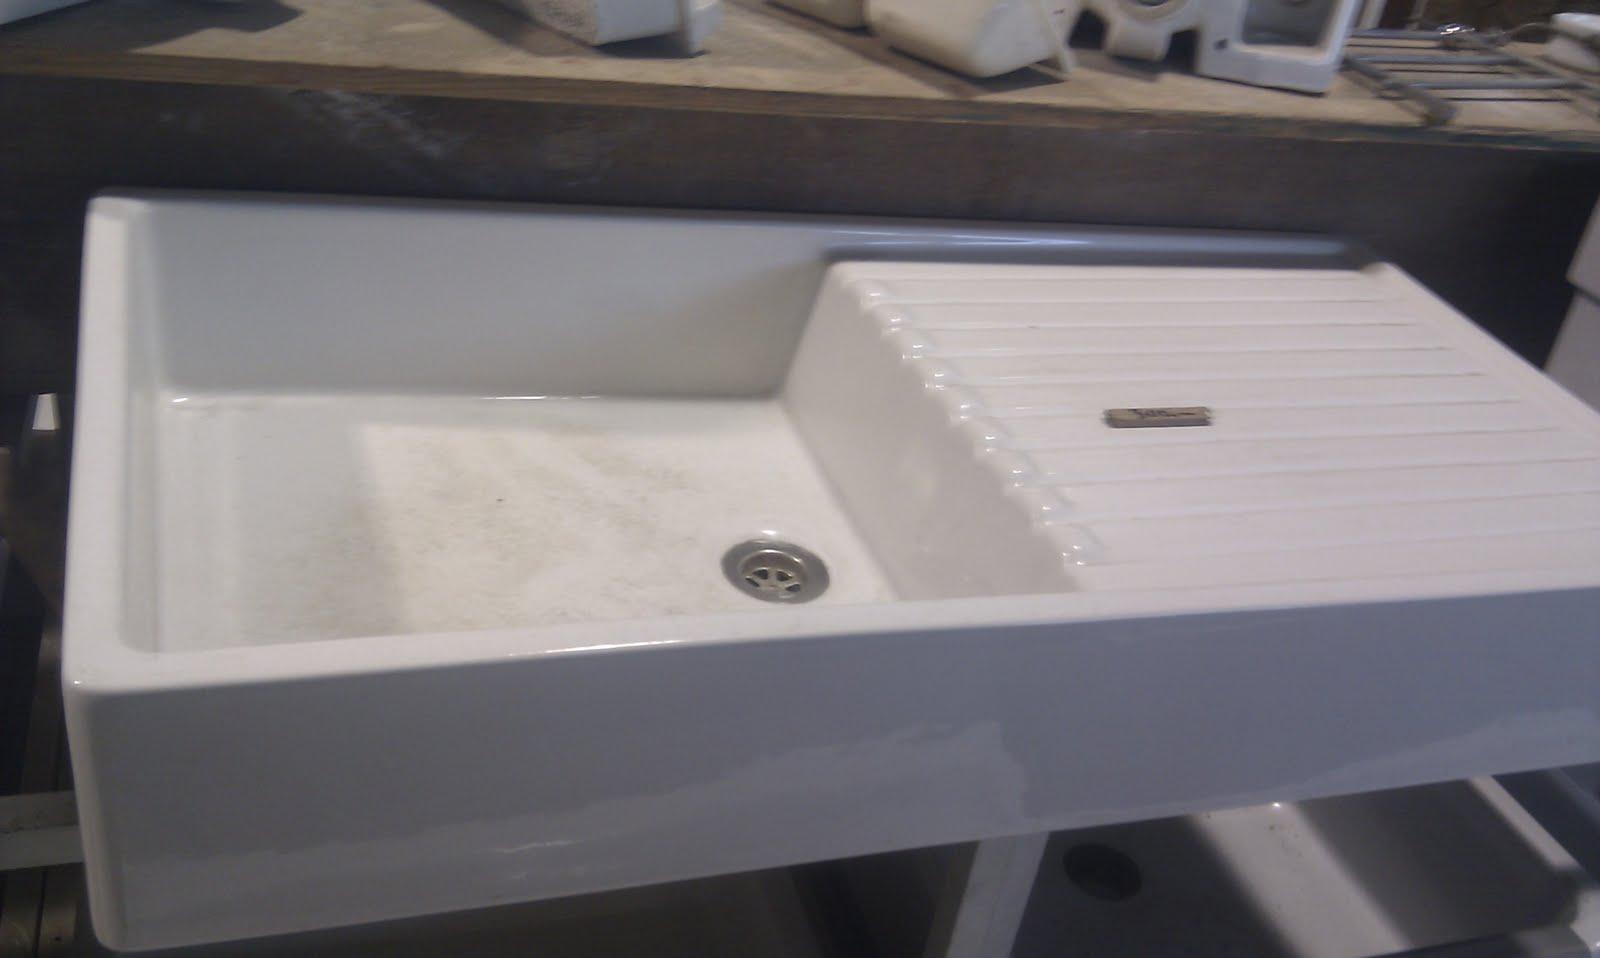 I N S P I R A T I E fabriek Oude bouwmaterialen # Wasbak Vloer_121814